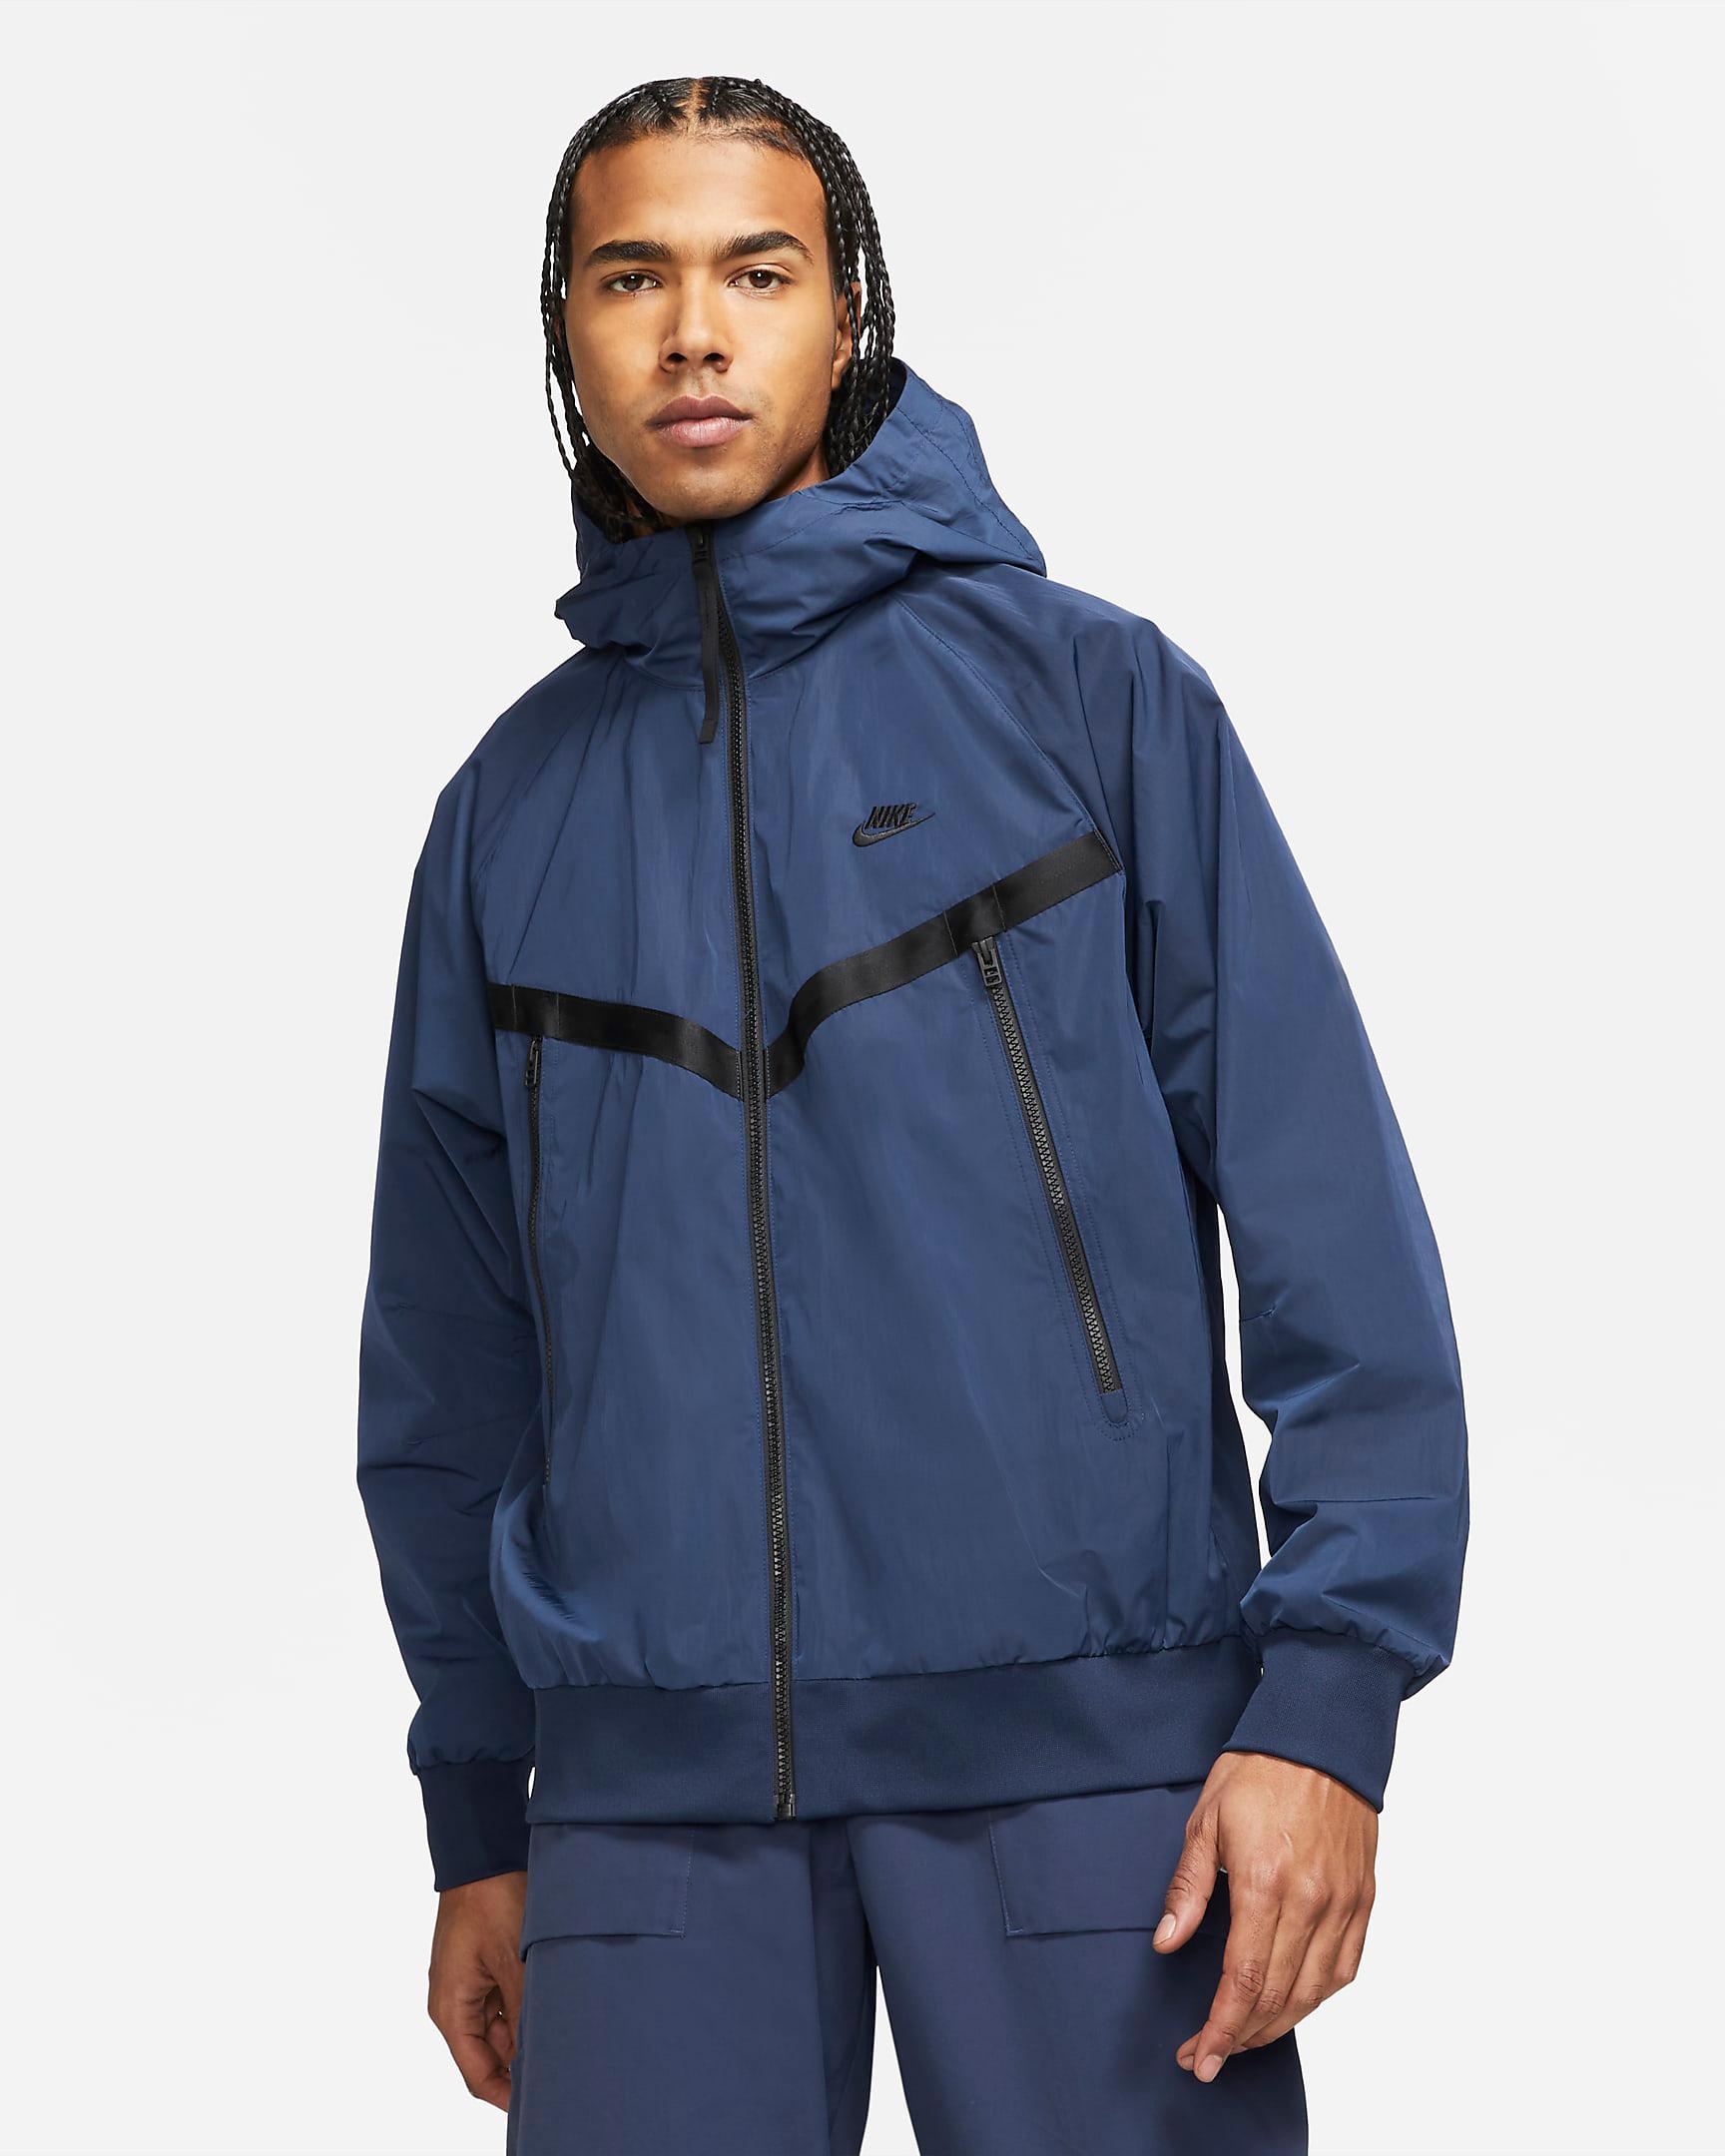 nike-windrunner-jacket-midnight-navy